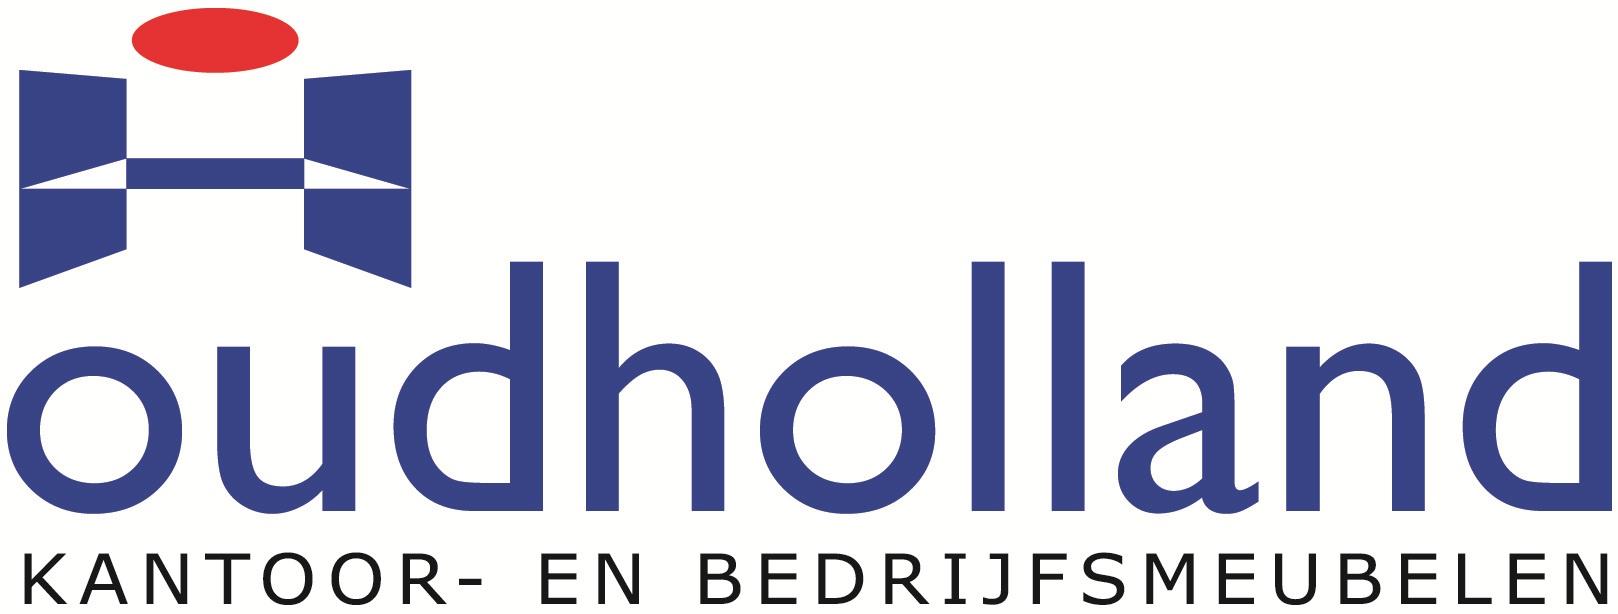 Logo oudholland 2012